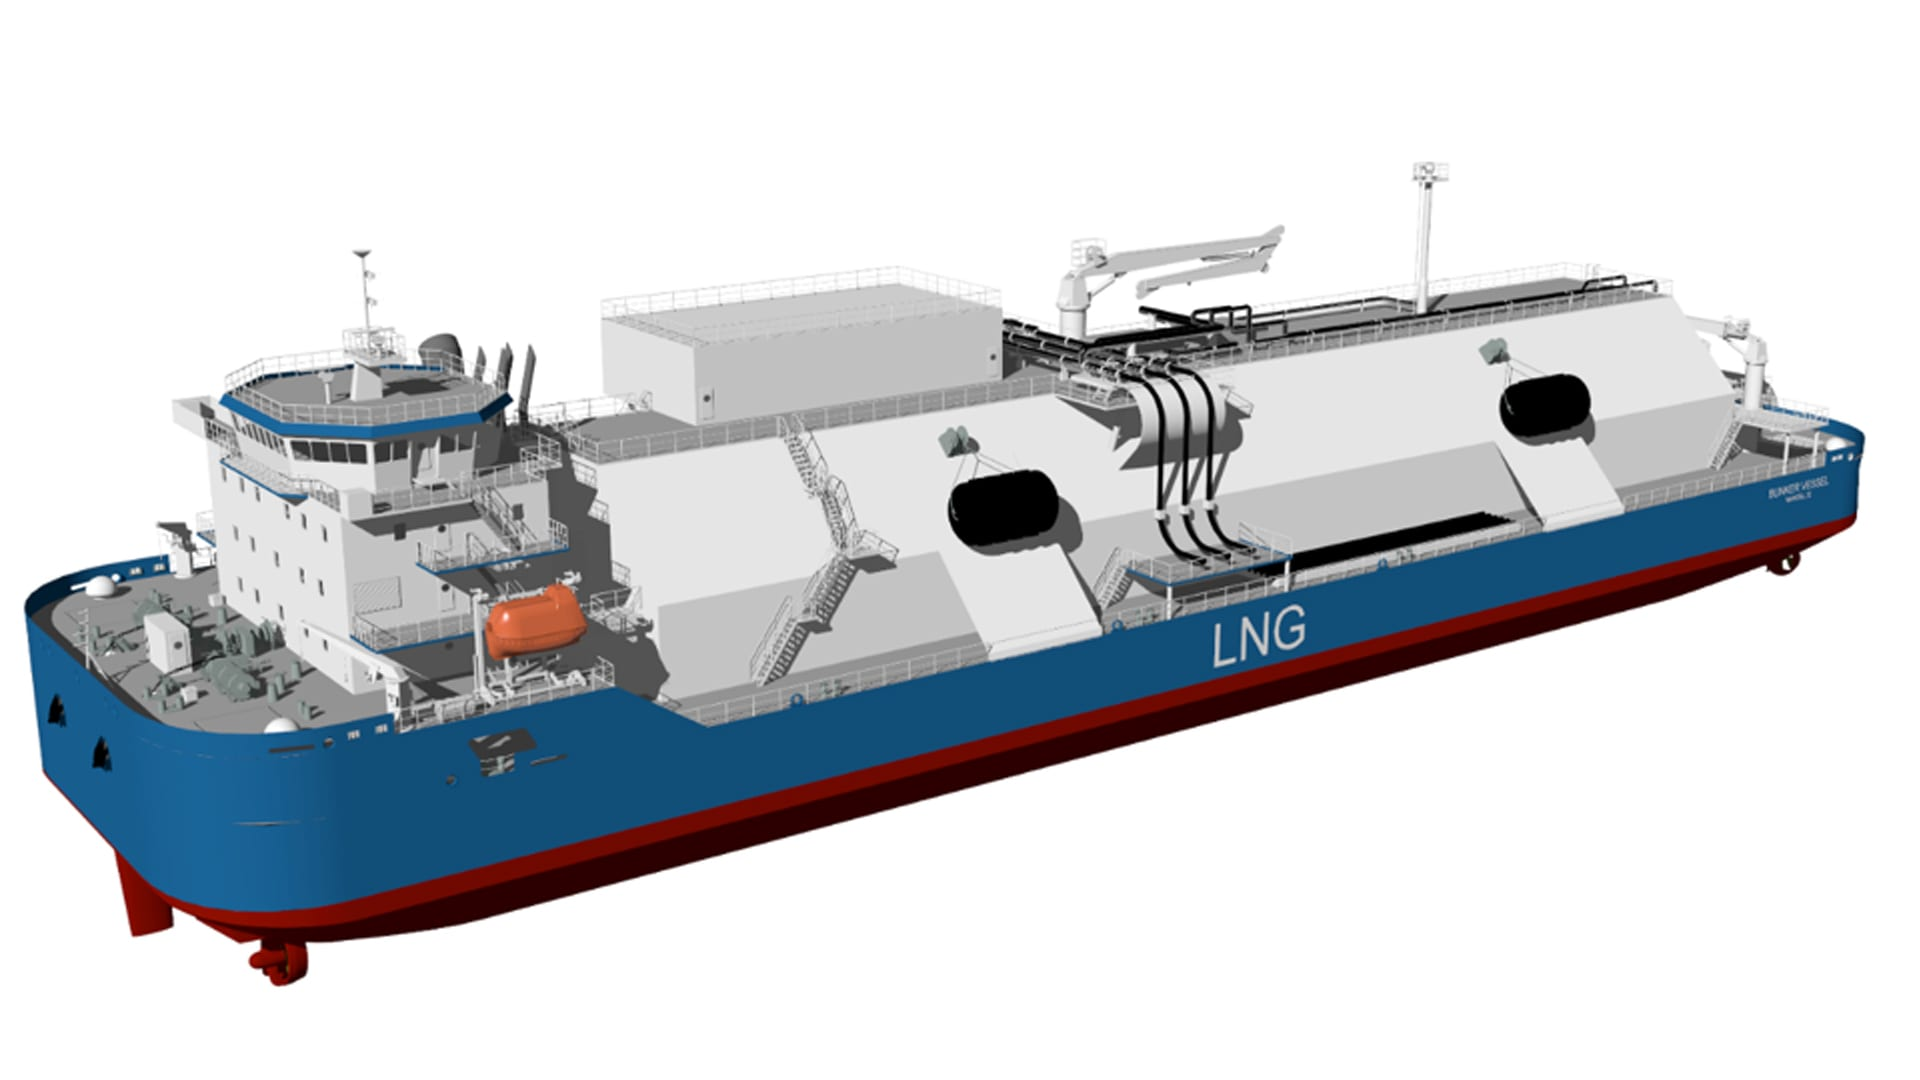 Bureau Veritas Grants AIP for 19,000 cbm LNG Bunkering Vessel Design